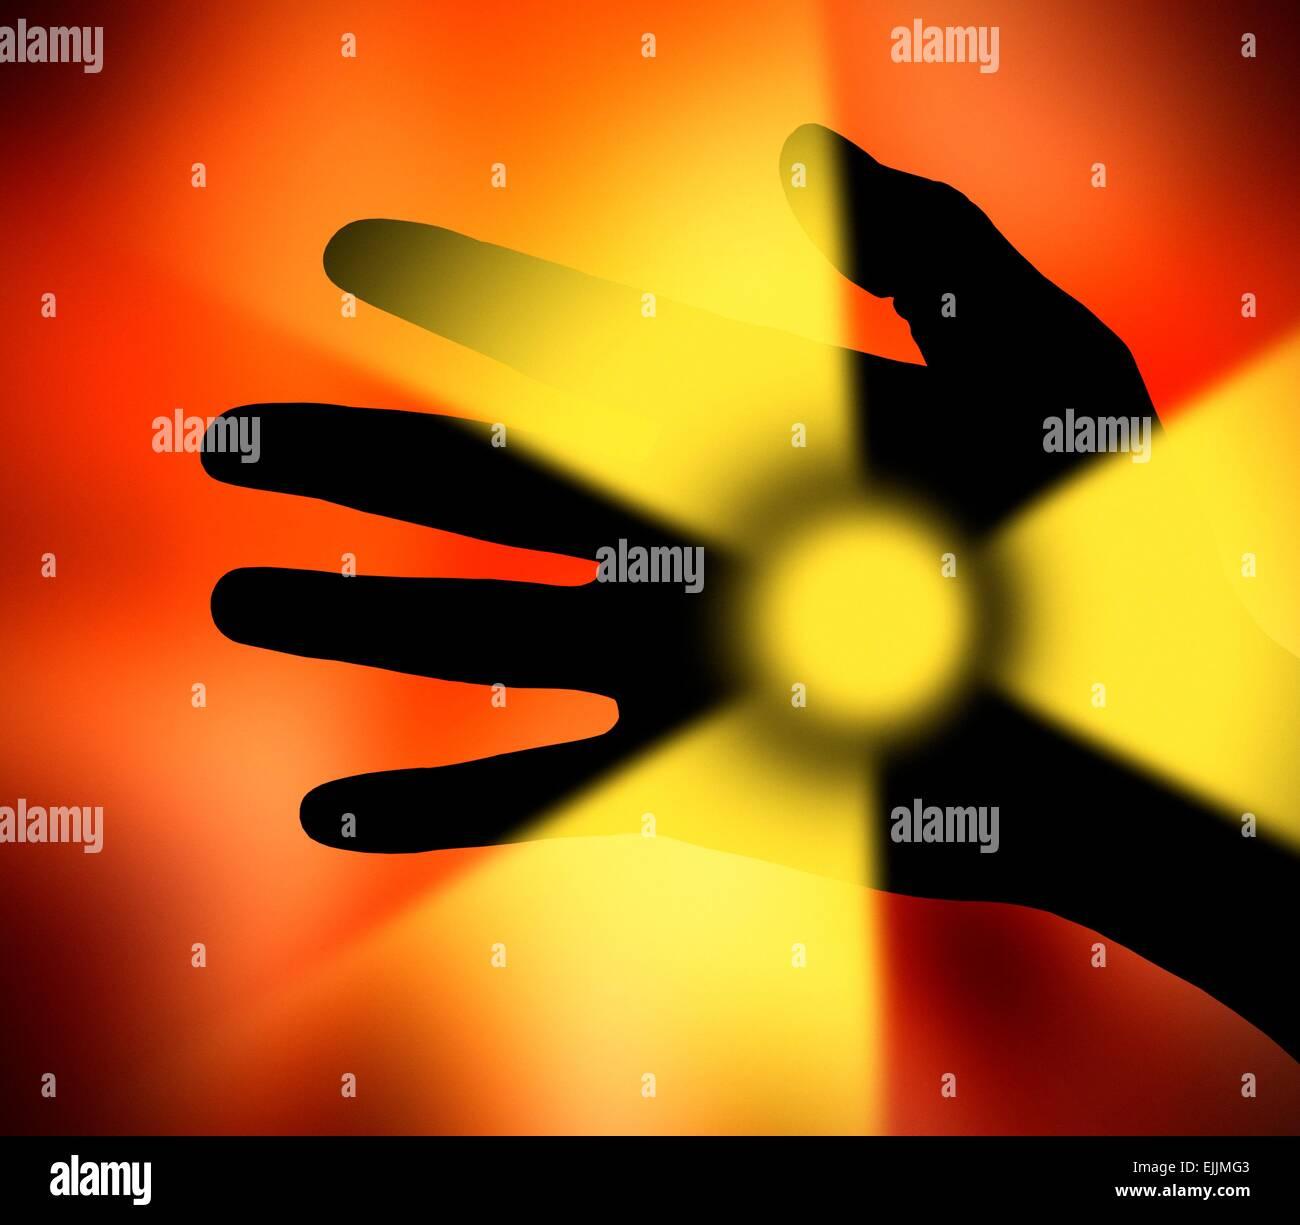 Hand and radiation symbol, computer artwork. - Stock Image